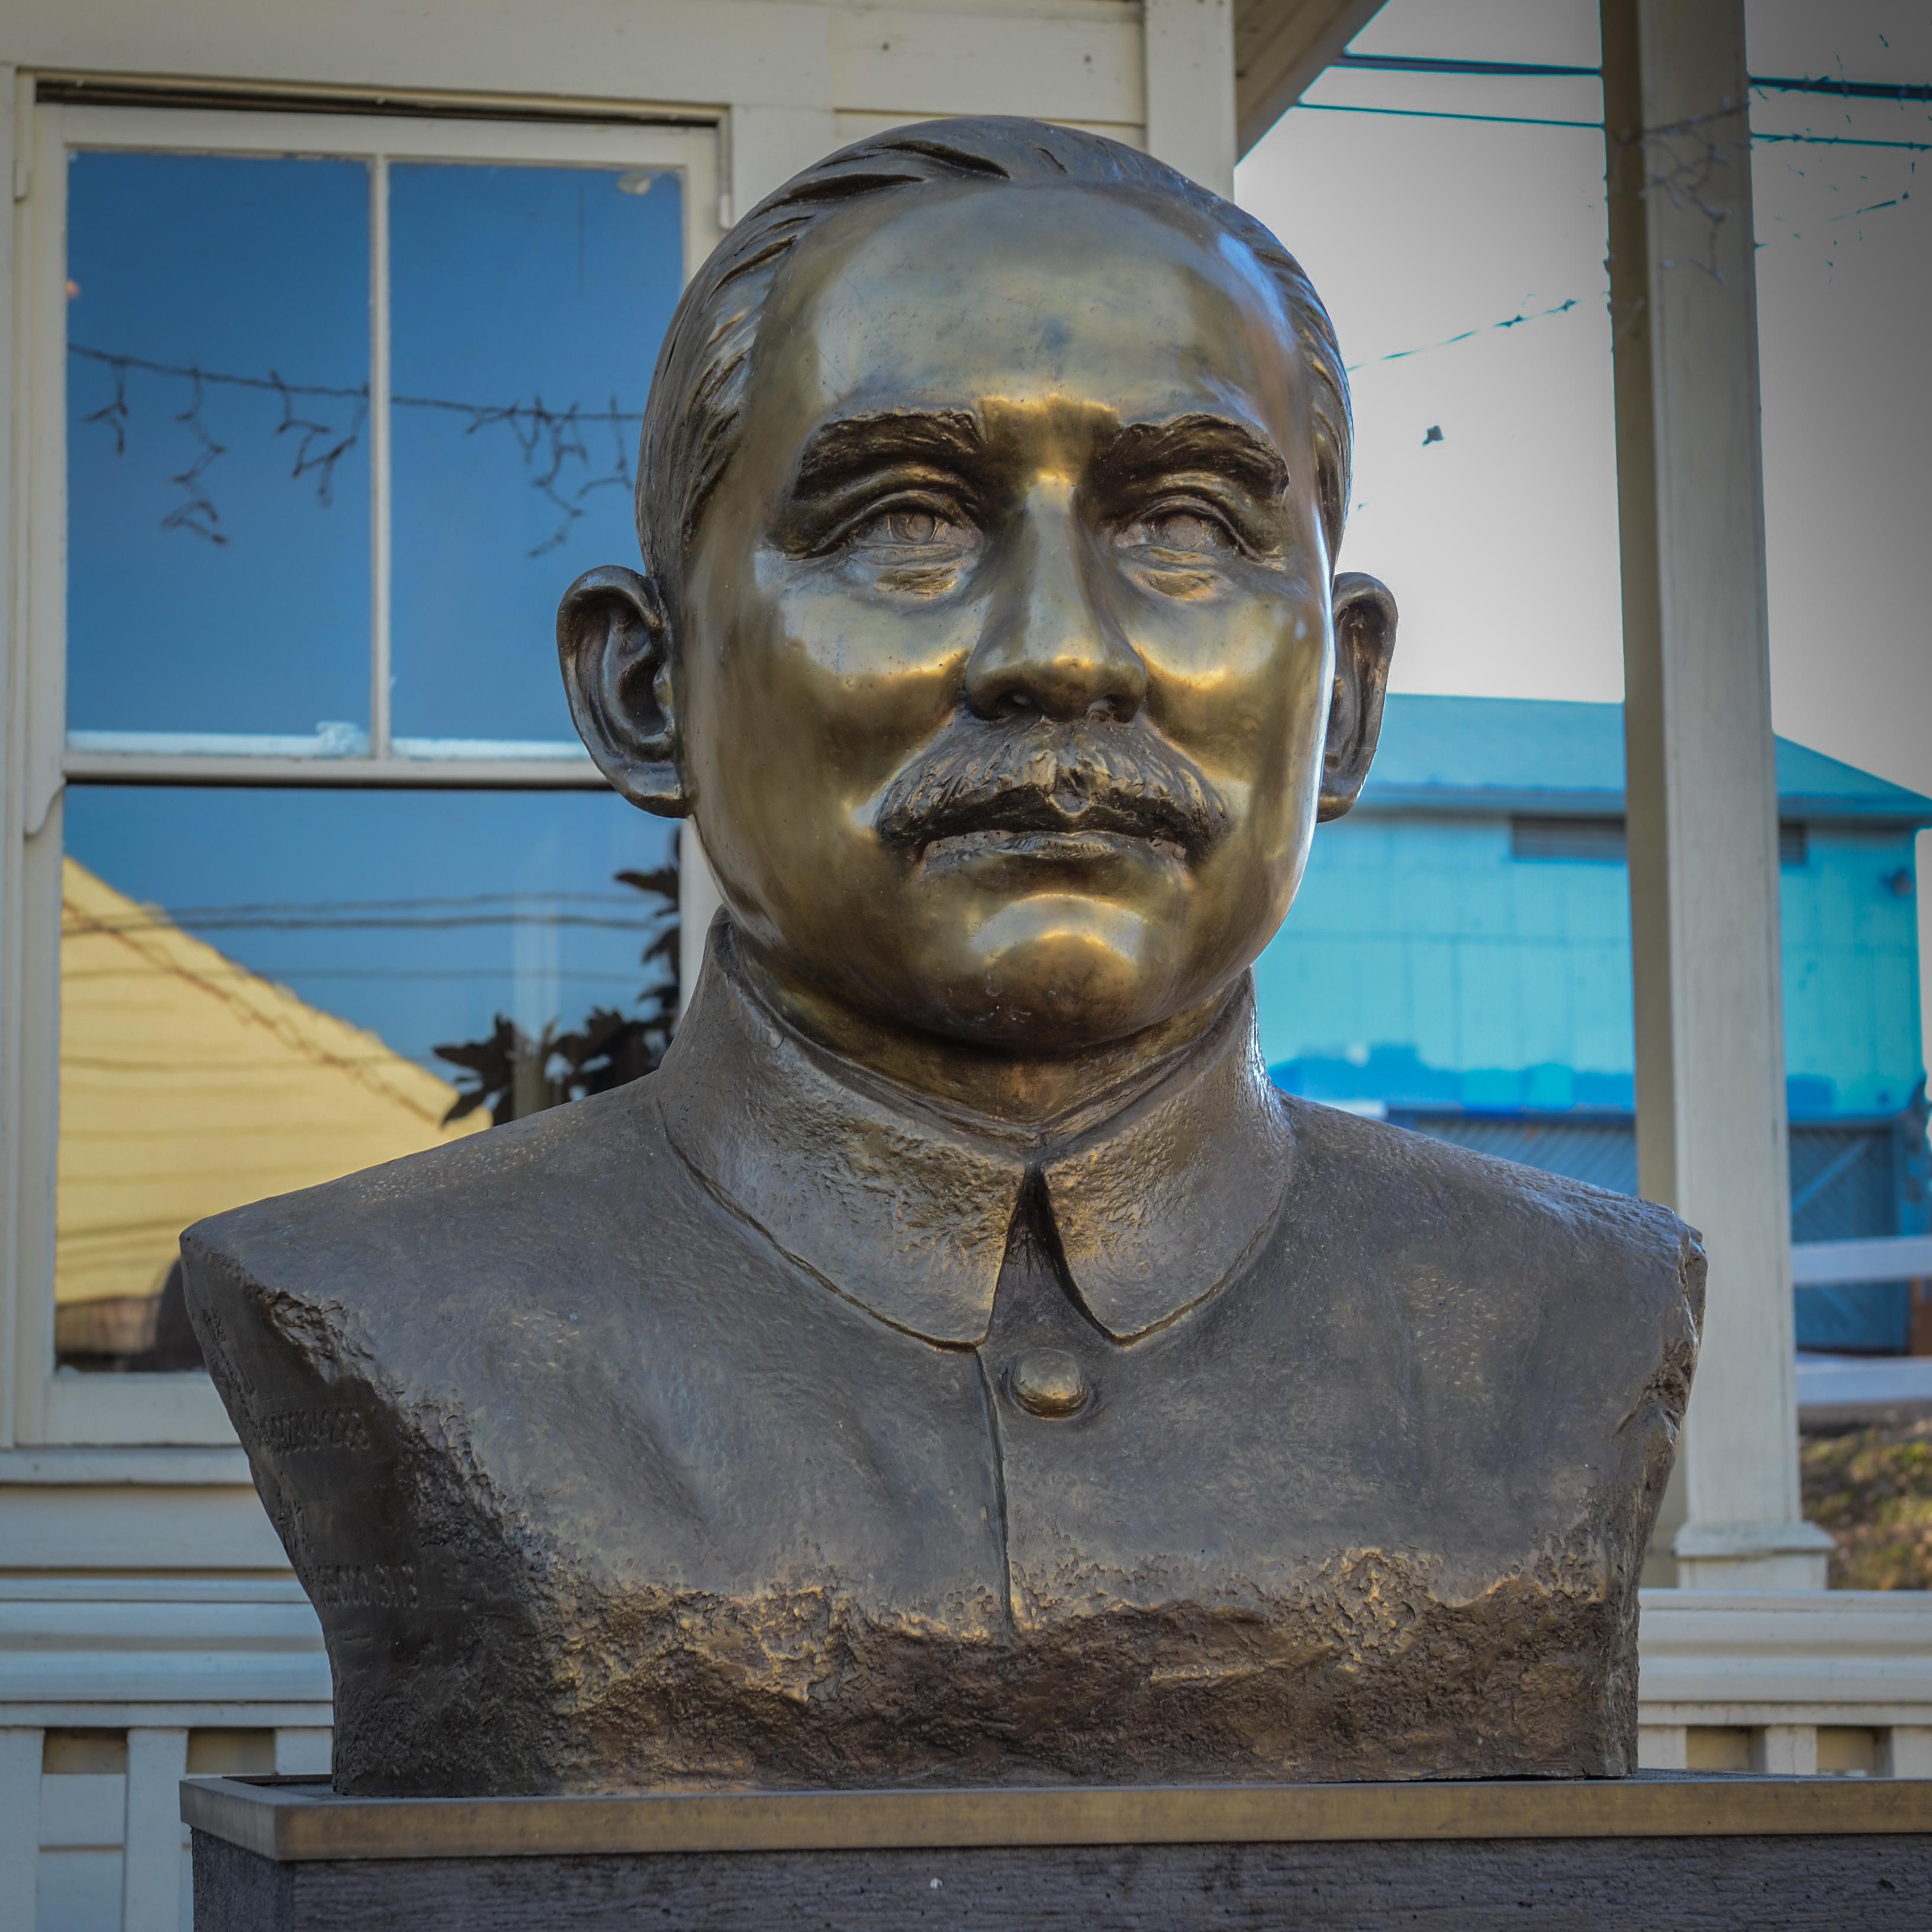 Dr. Sun Yat-sen (1866-1925). Bronze statue in Locke, CA